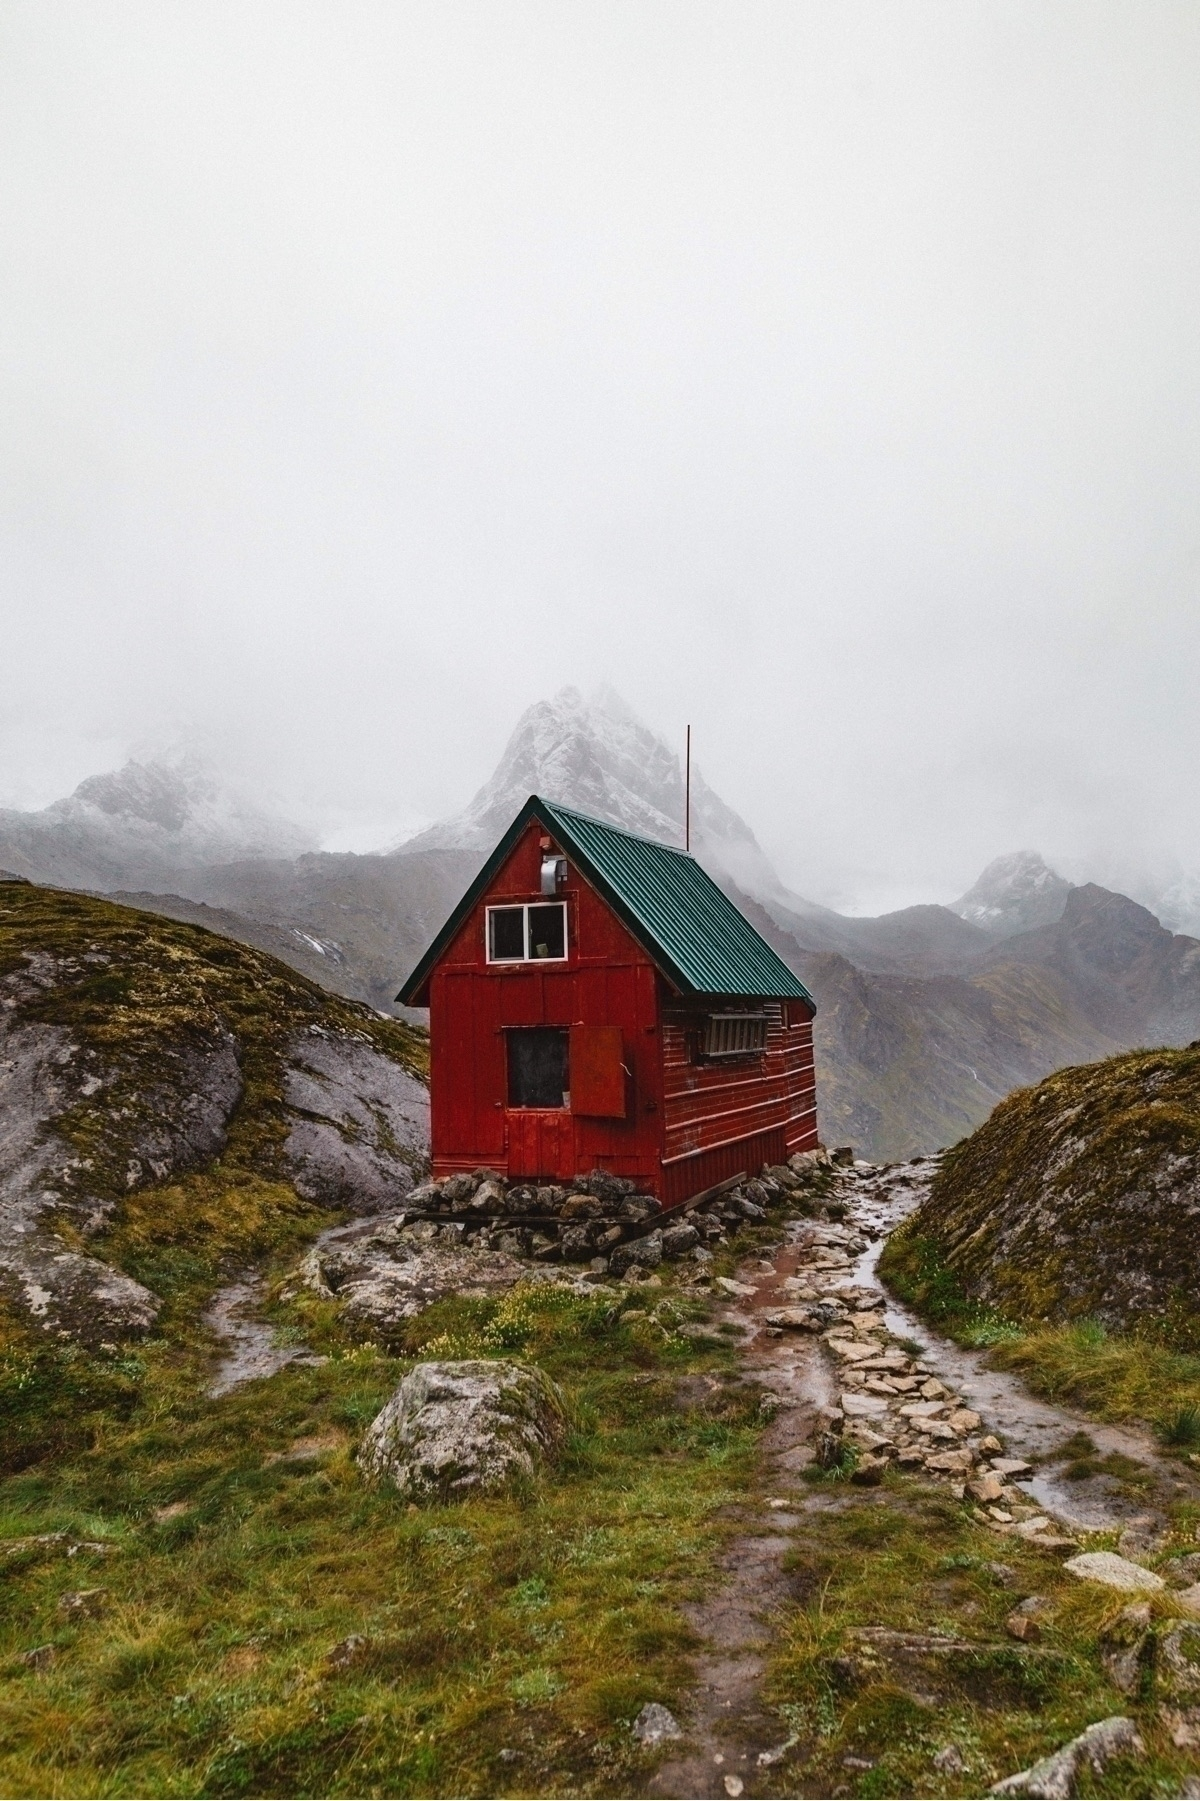 Mint Hut Talkeetna Mountains, A - connorgrasso | ello